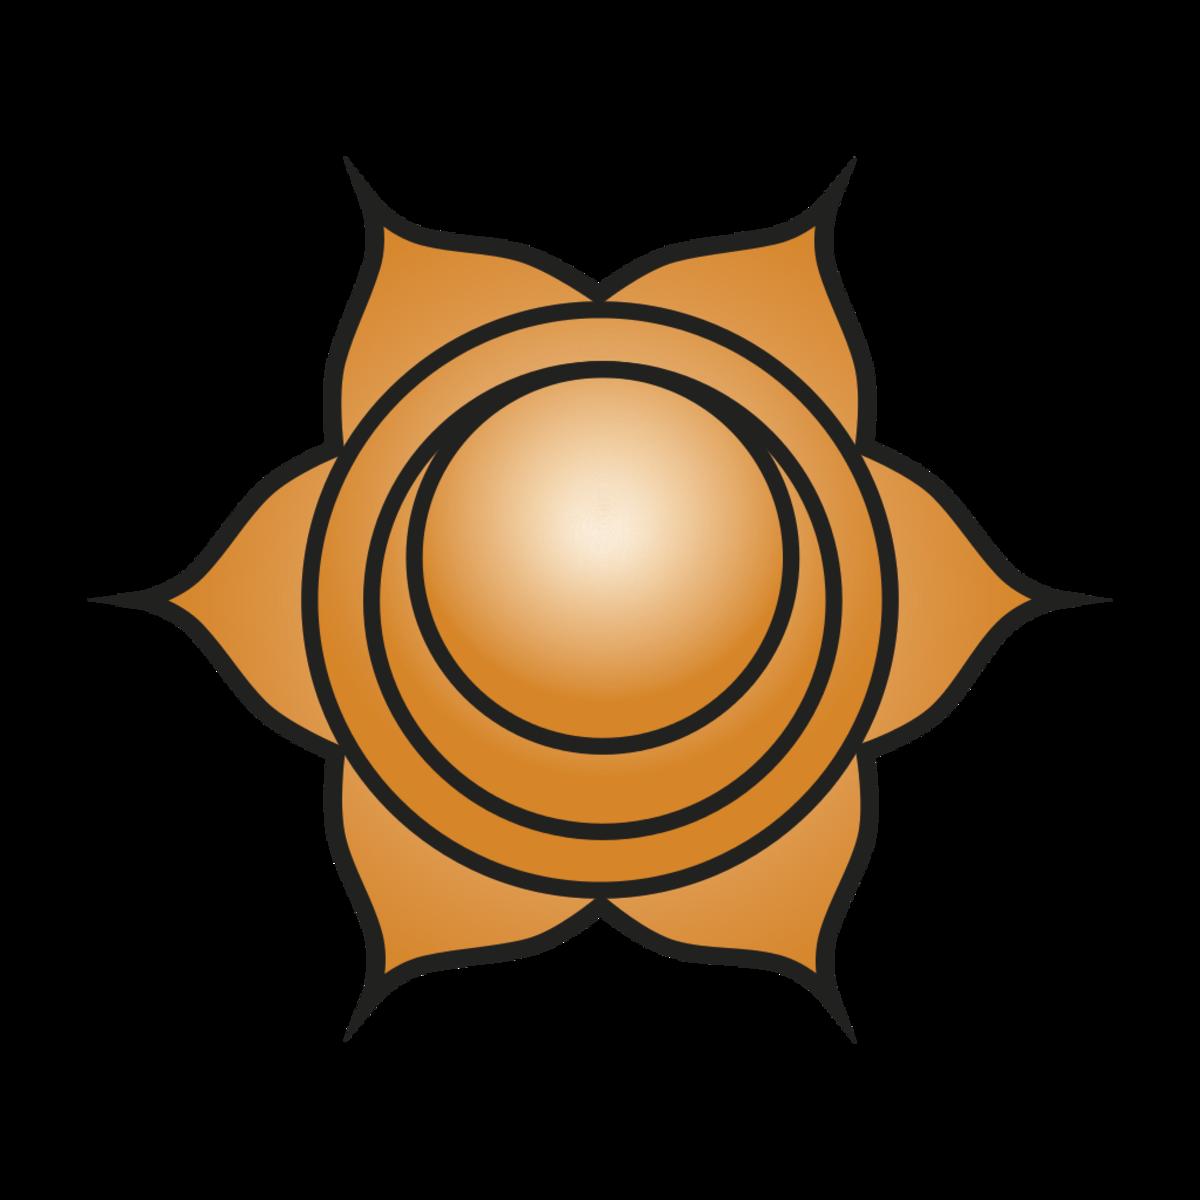 Orange can be symbolic of the sacral chakra.